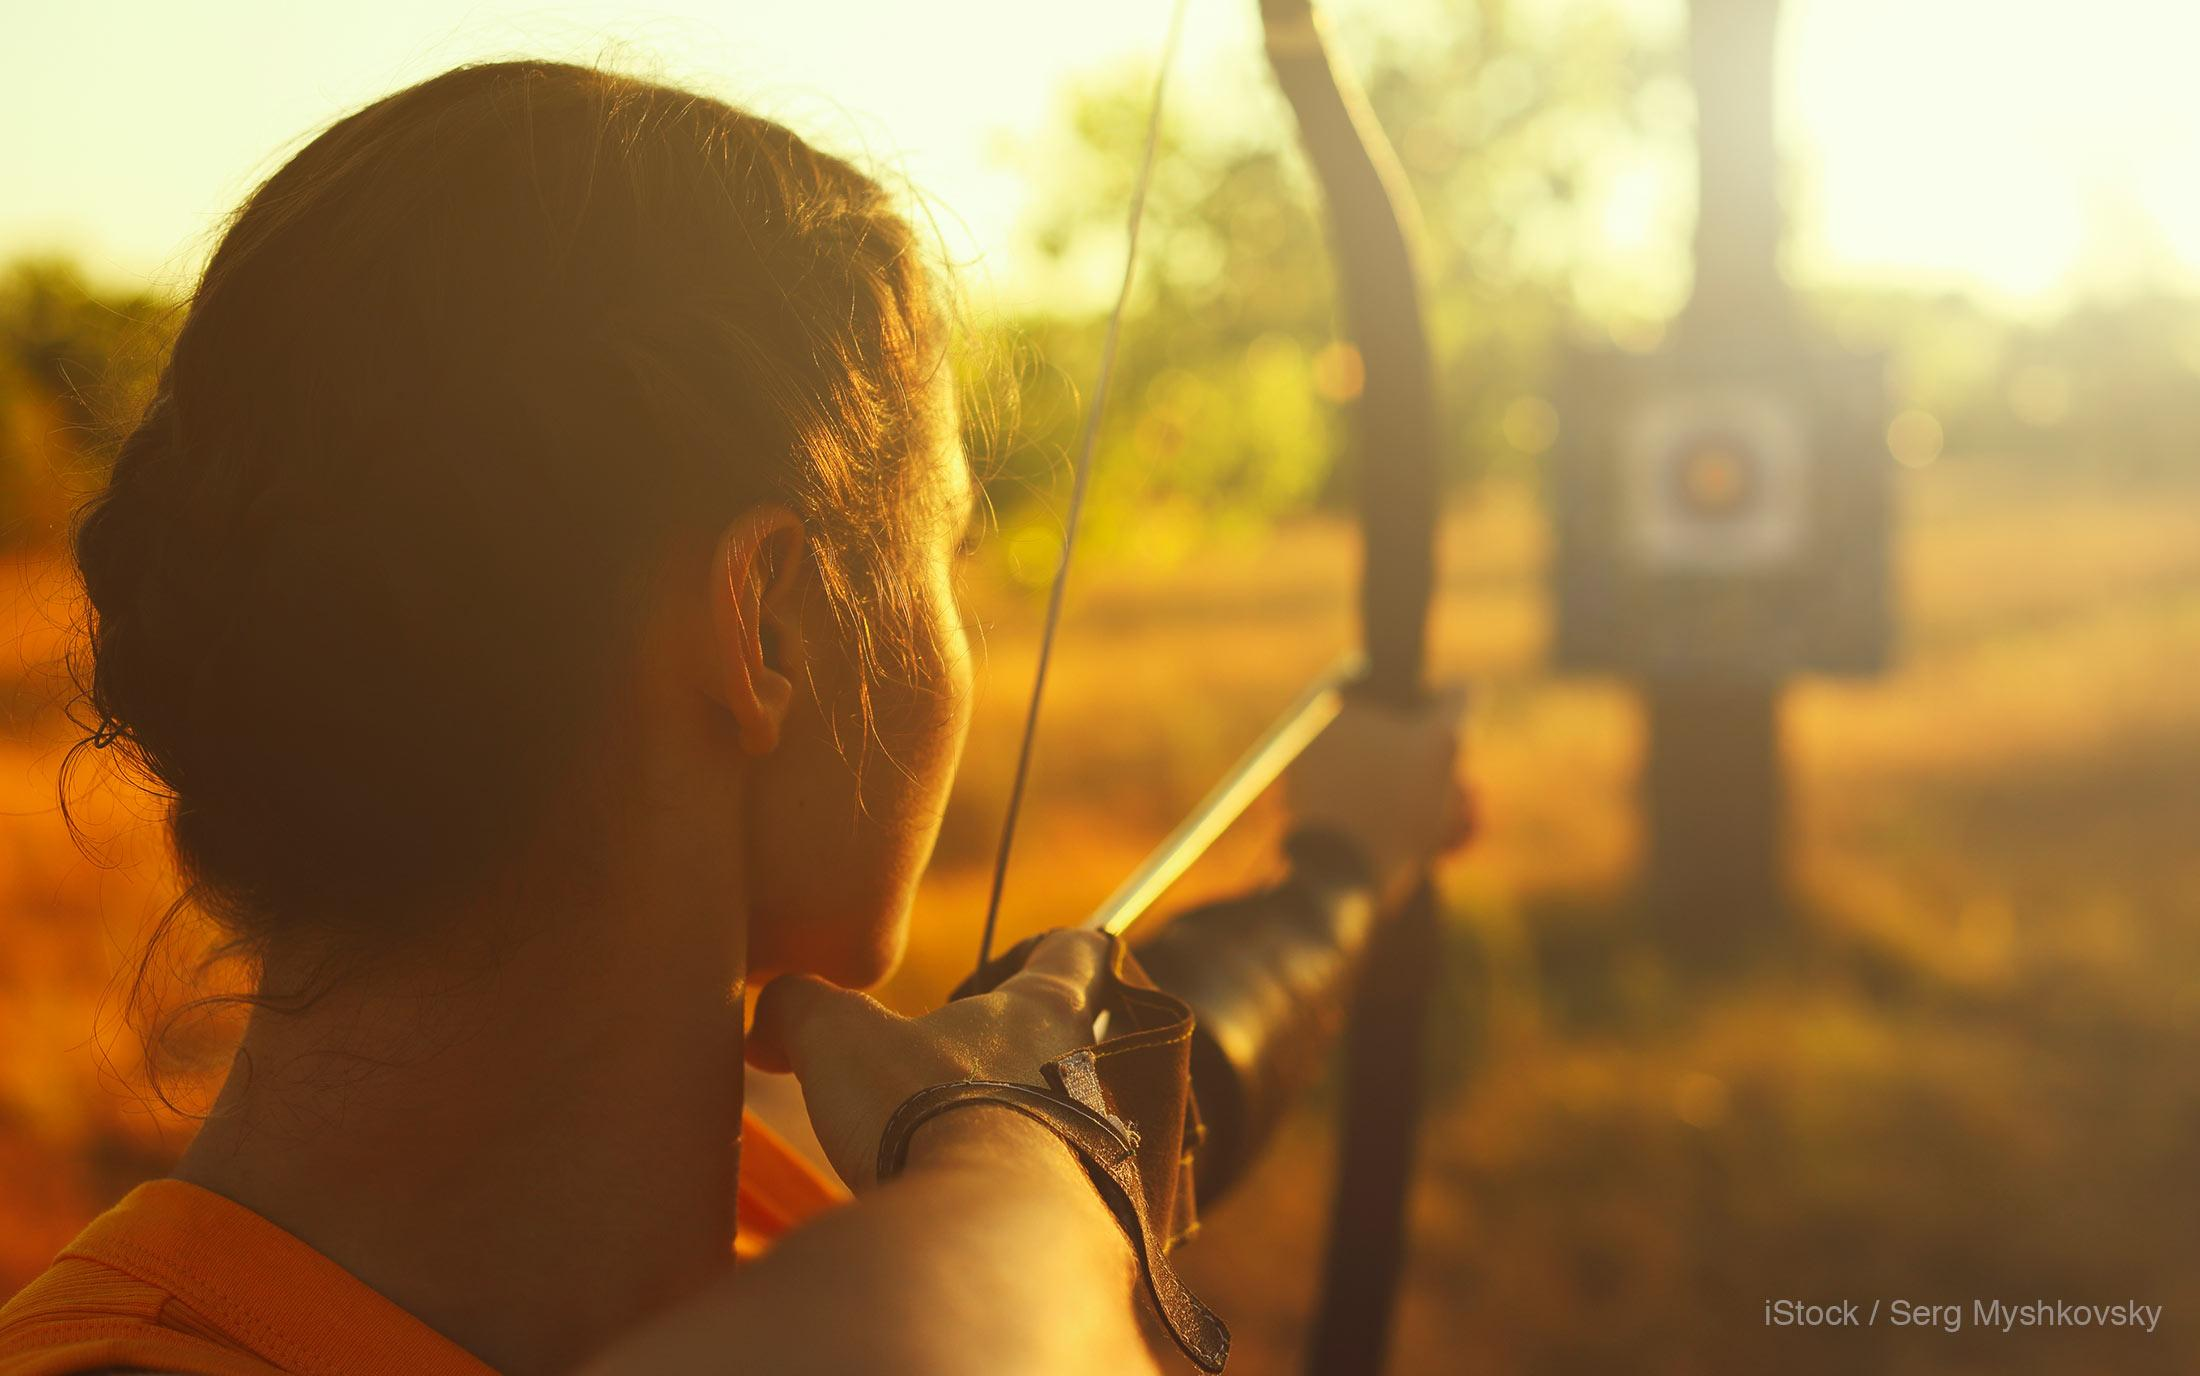 becoming a target